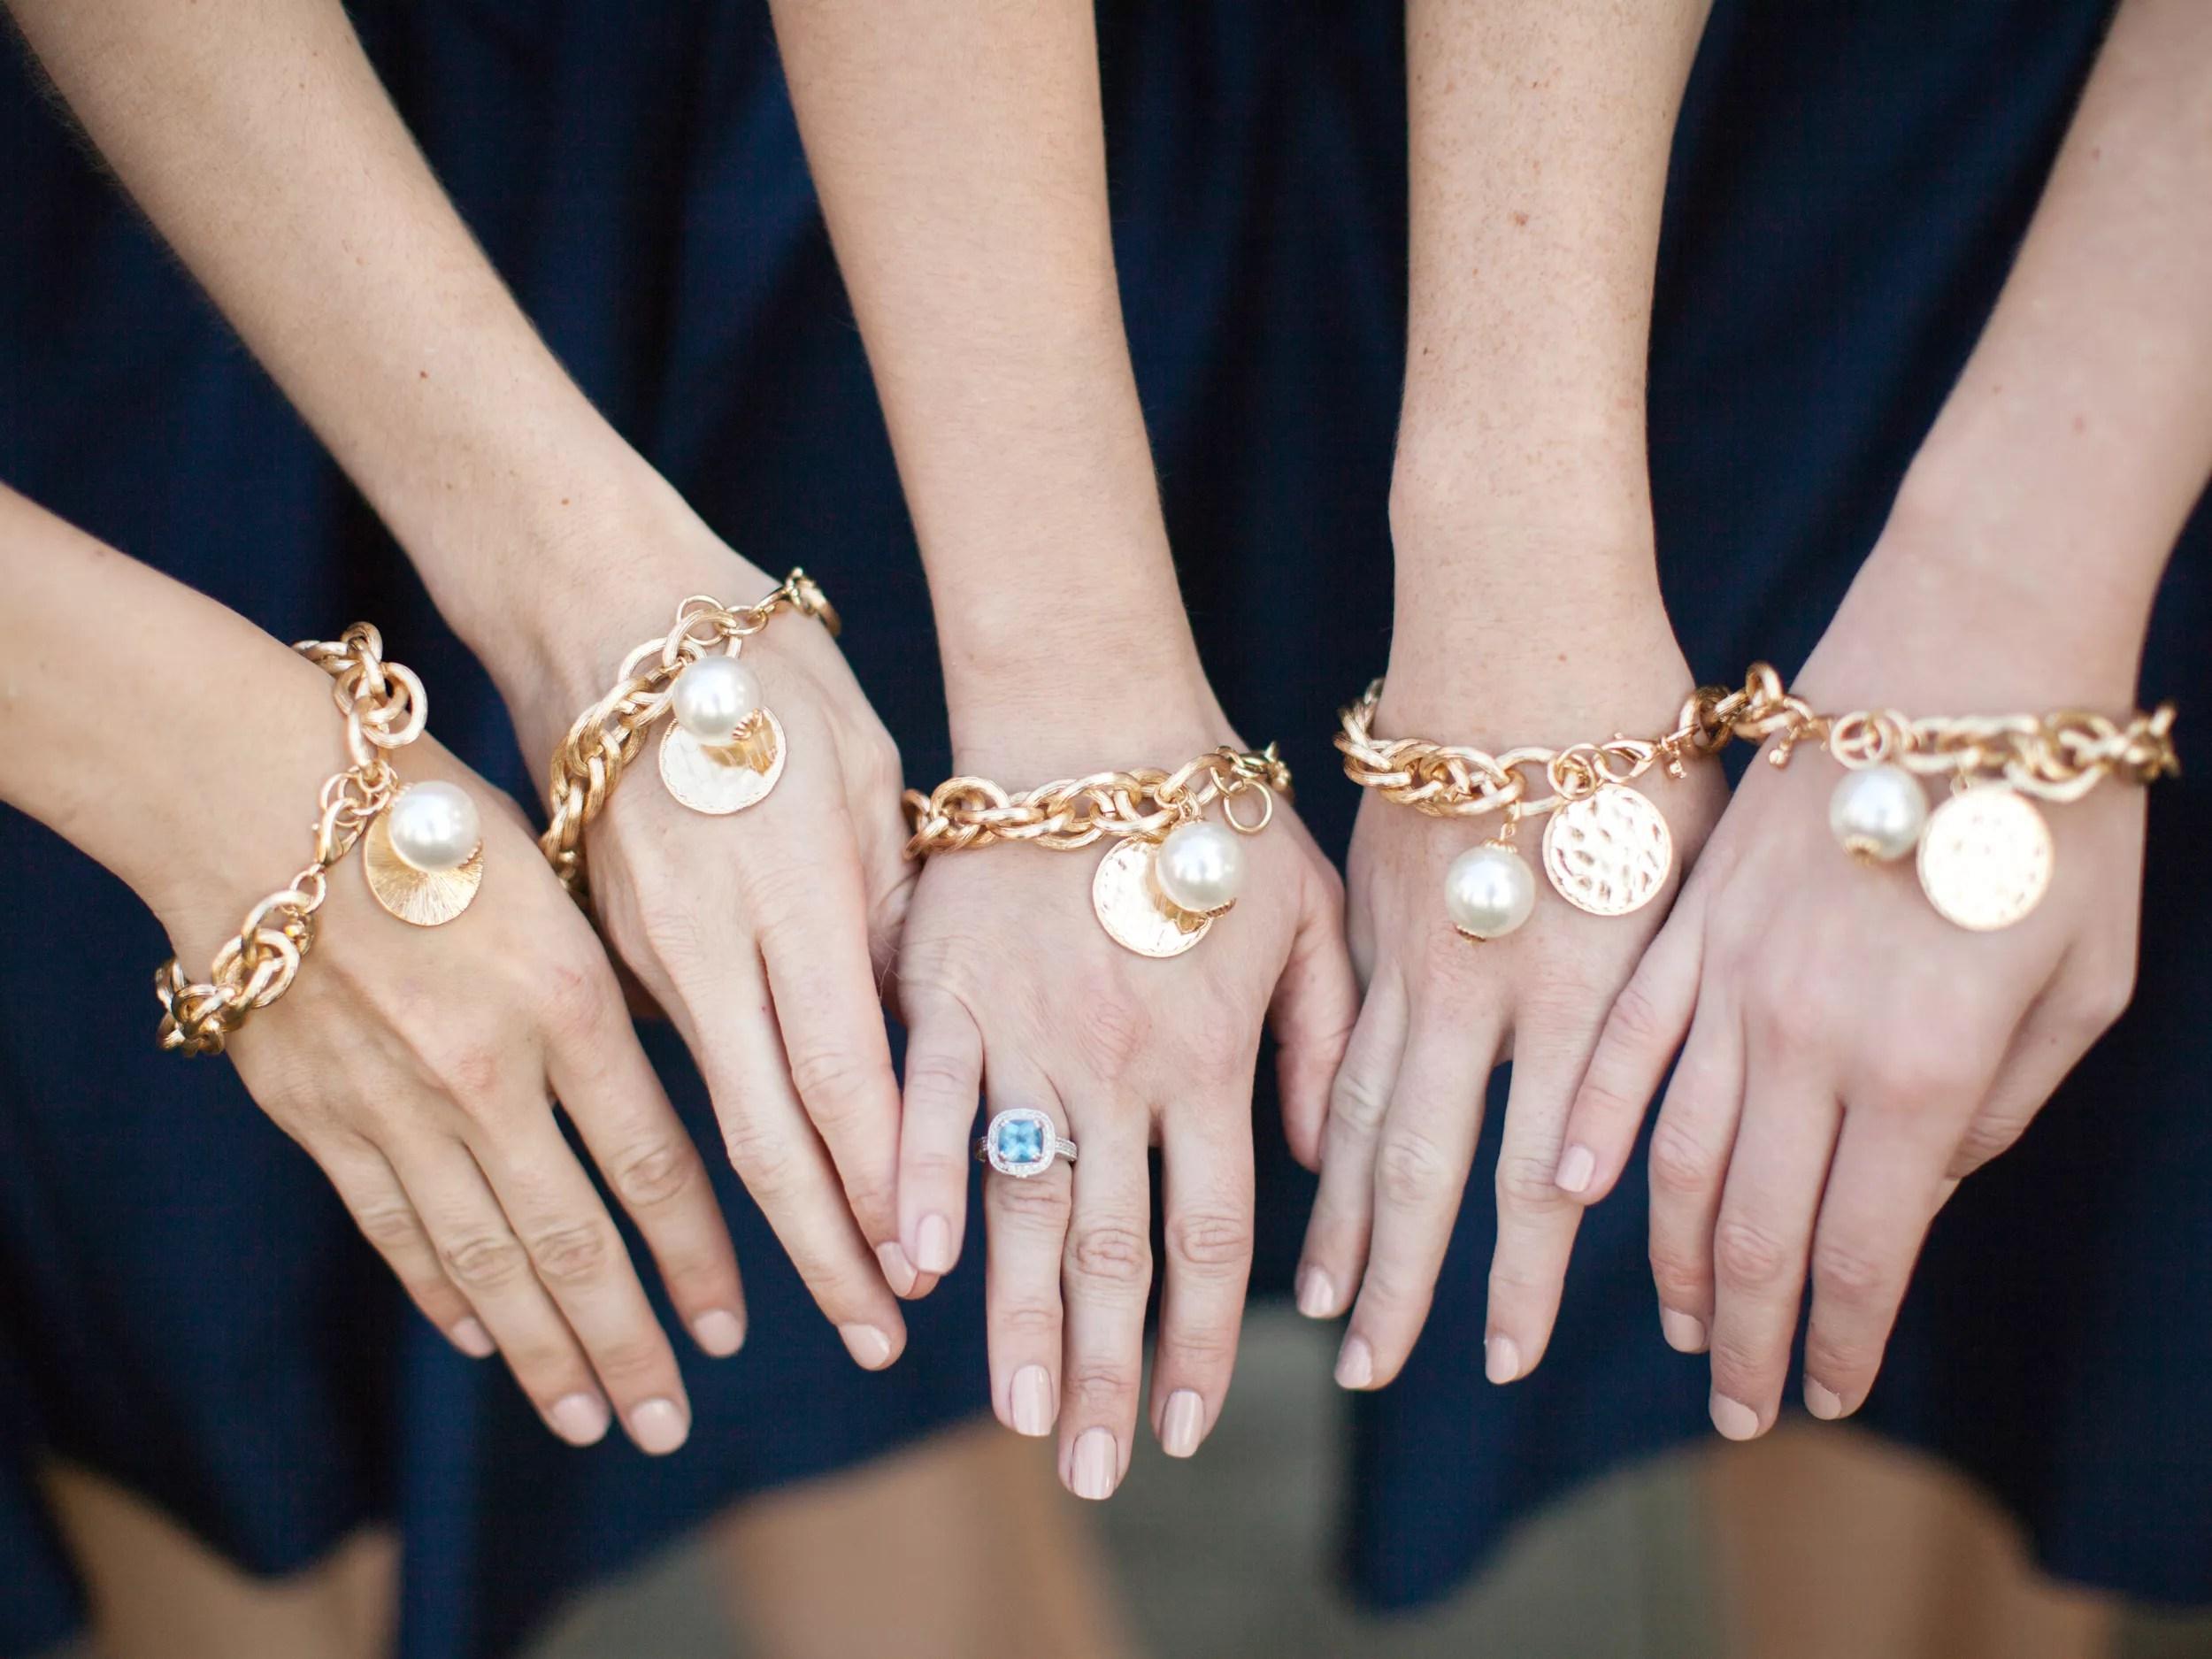 Bridesmaid Gift Shopping Tips & Etiquette